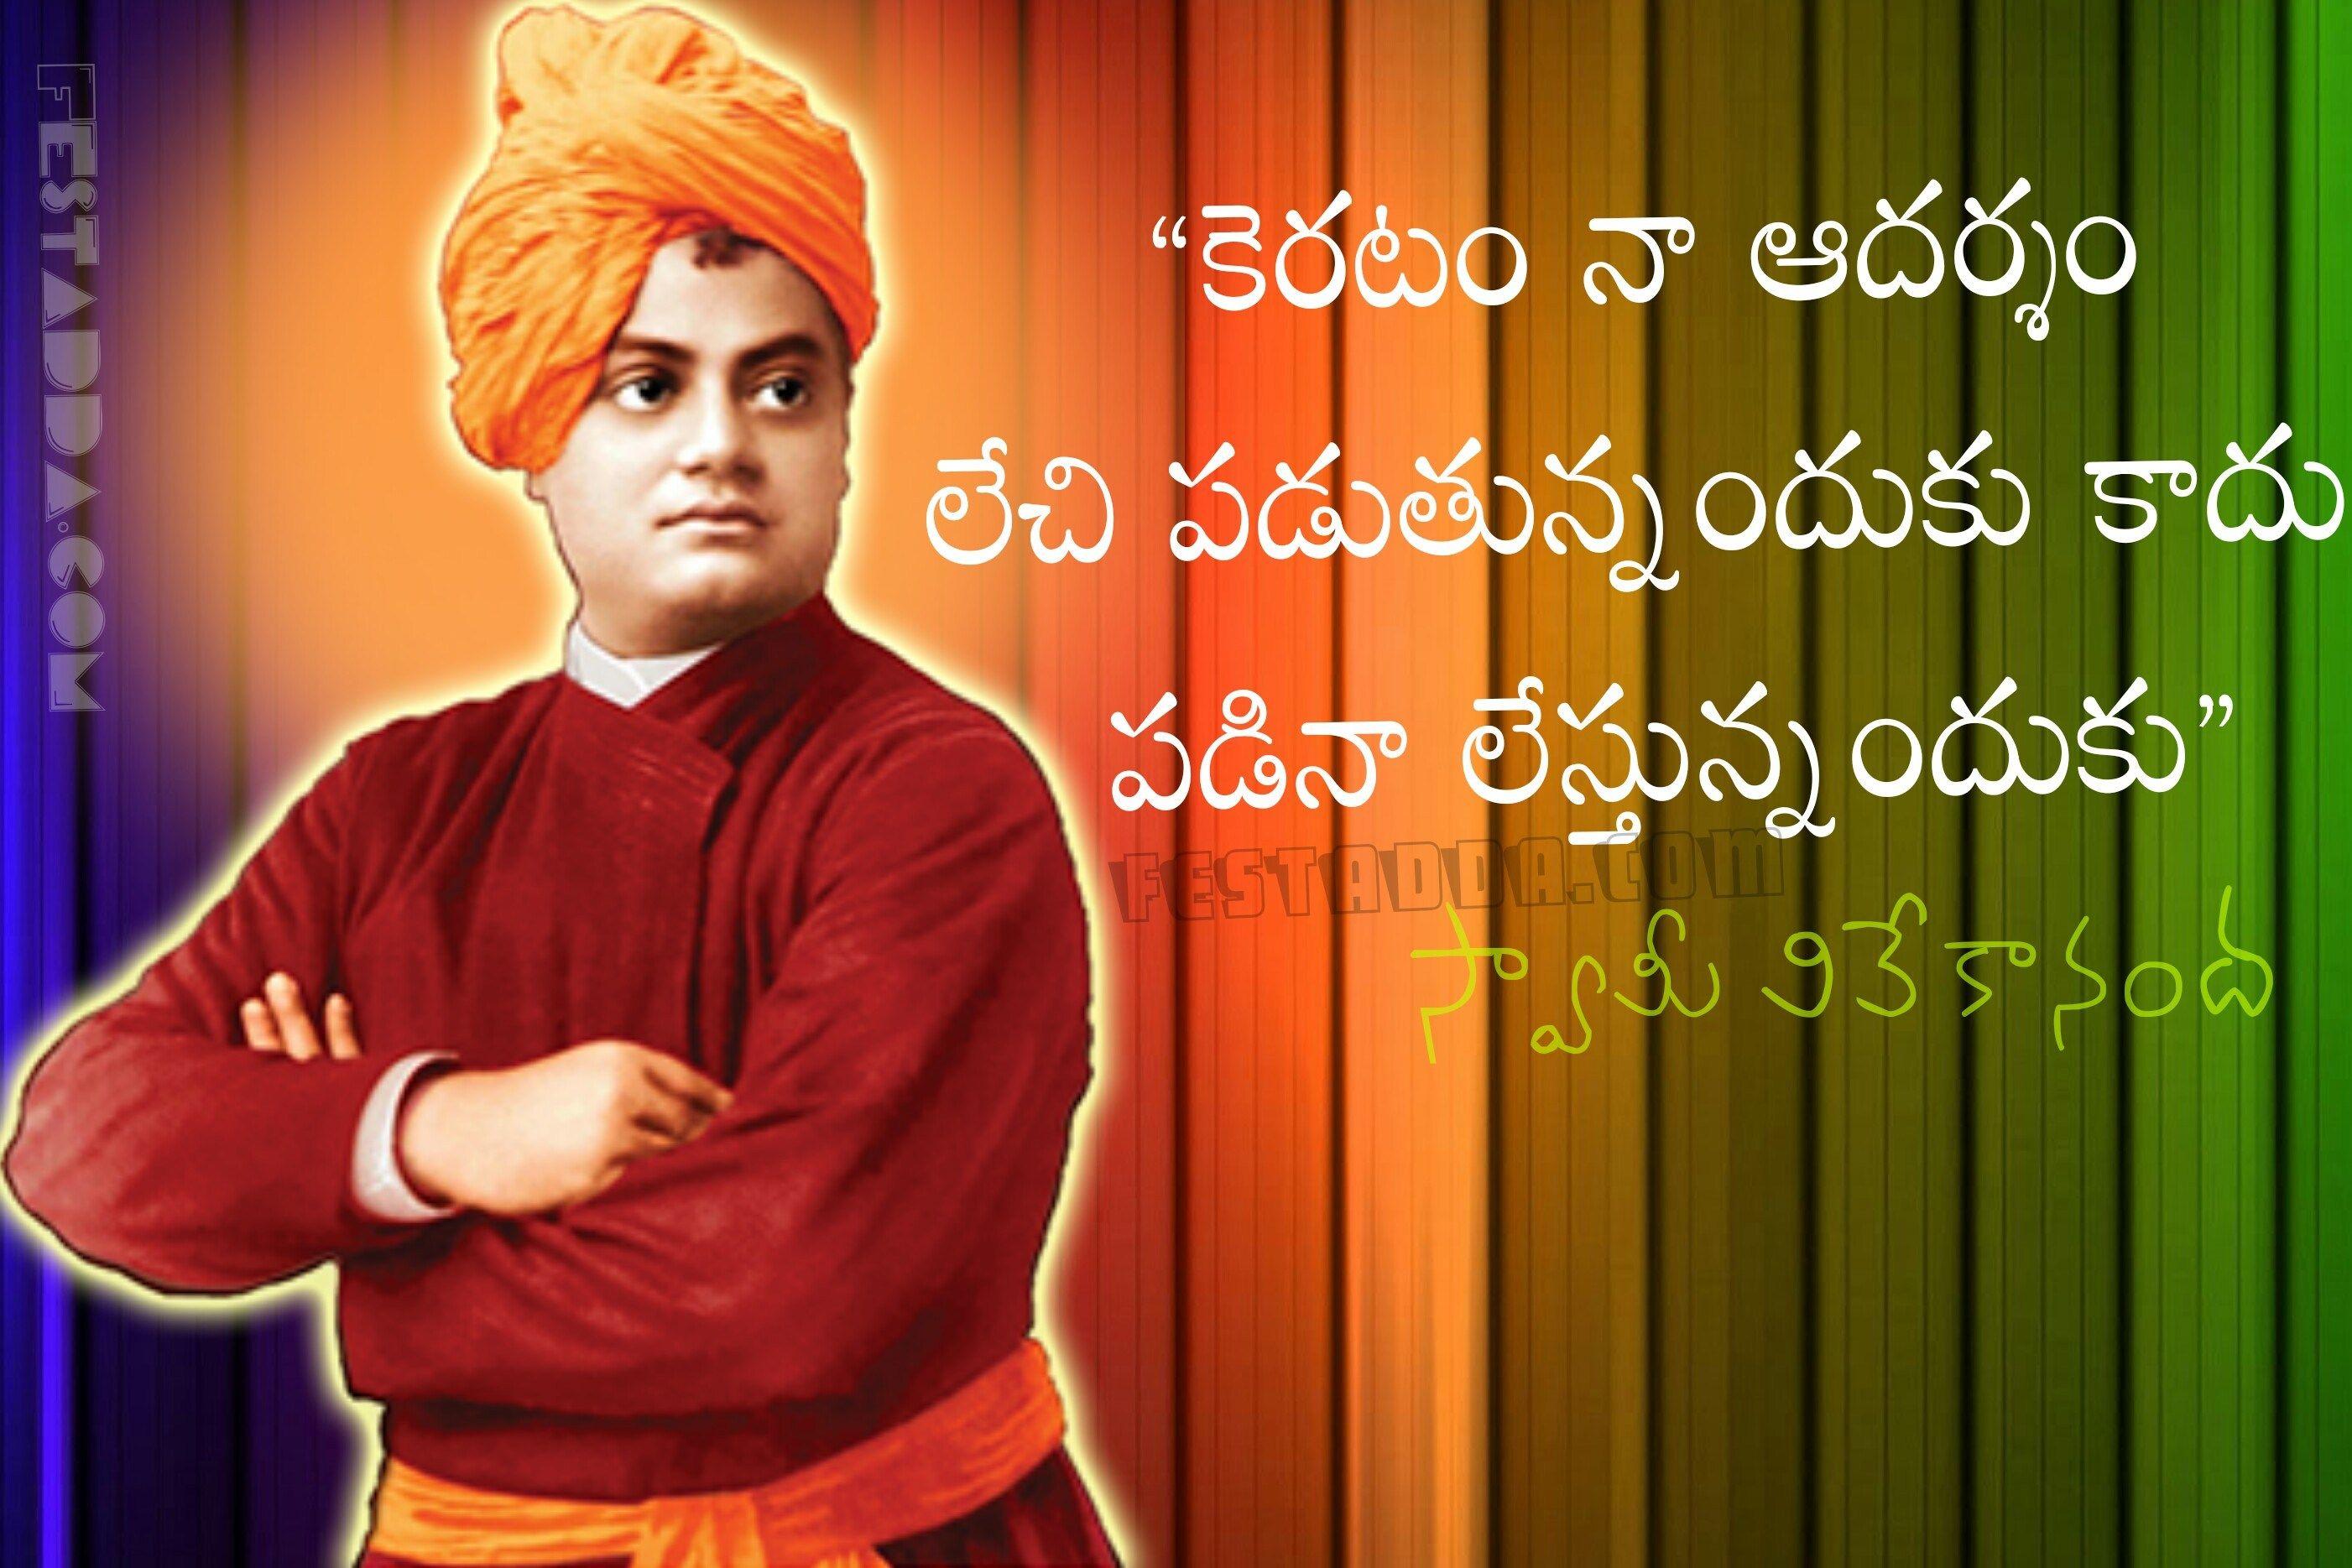 swami vivekananda quotes in telugu swami vivekananda quotes